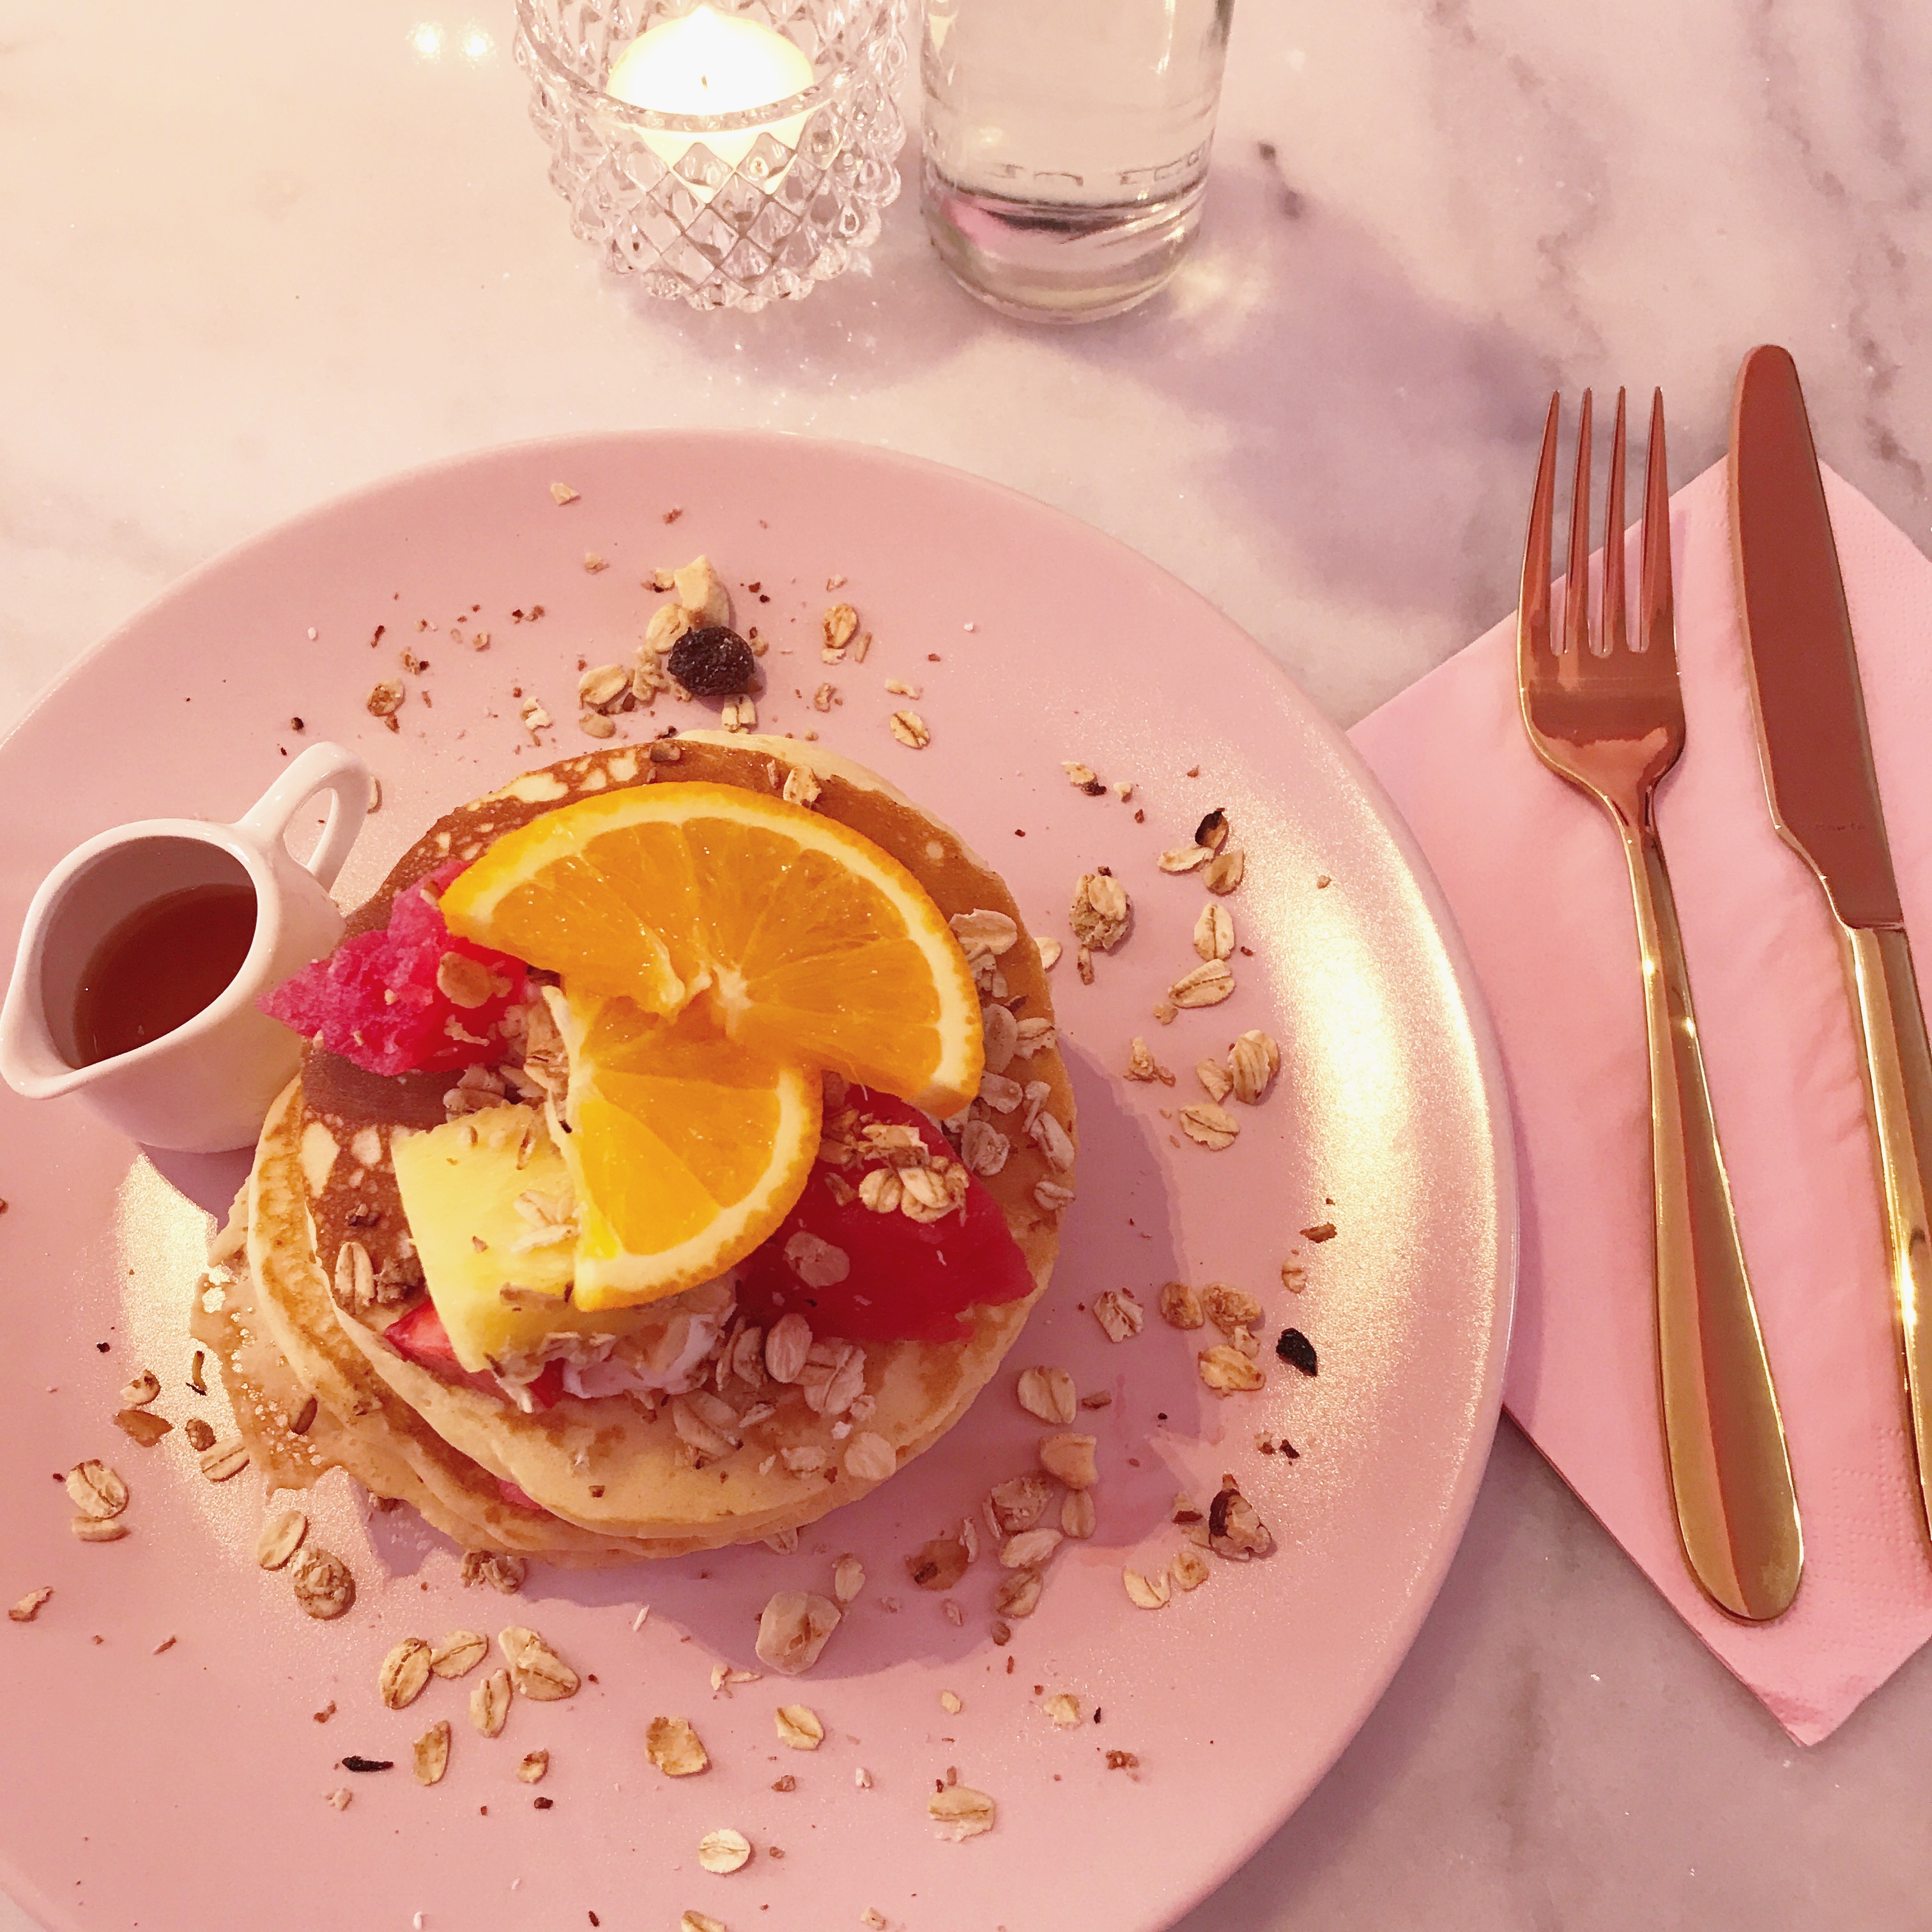 Maiden Magazine spot: Eatery The Pancake